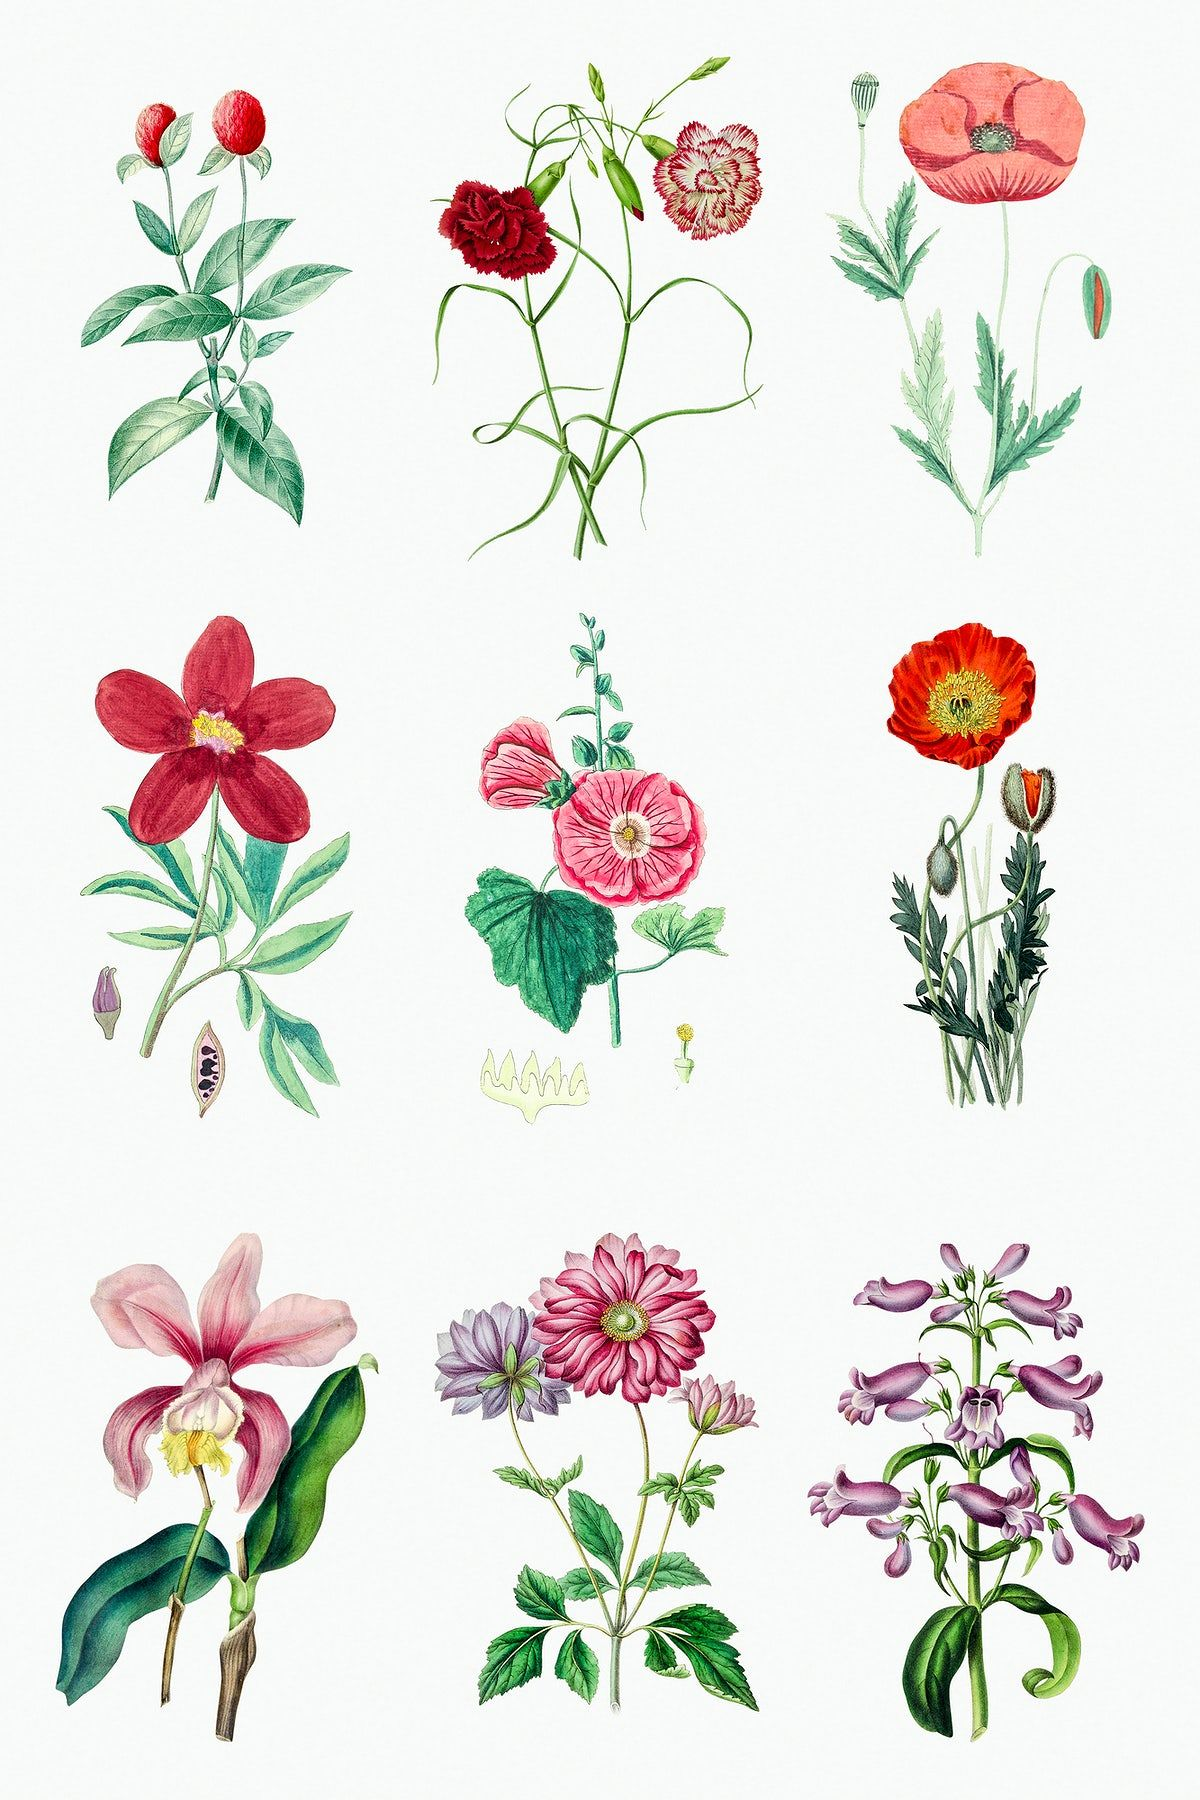 Vintage Tropical Flower Design Element Set Premium Image By Rawpixel Com In 2020 Design Element Sticker Design Tropical Flowers